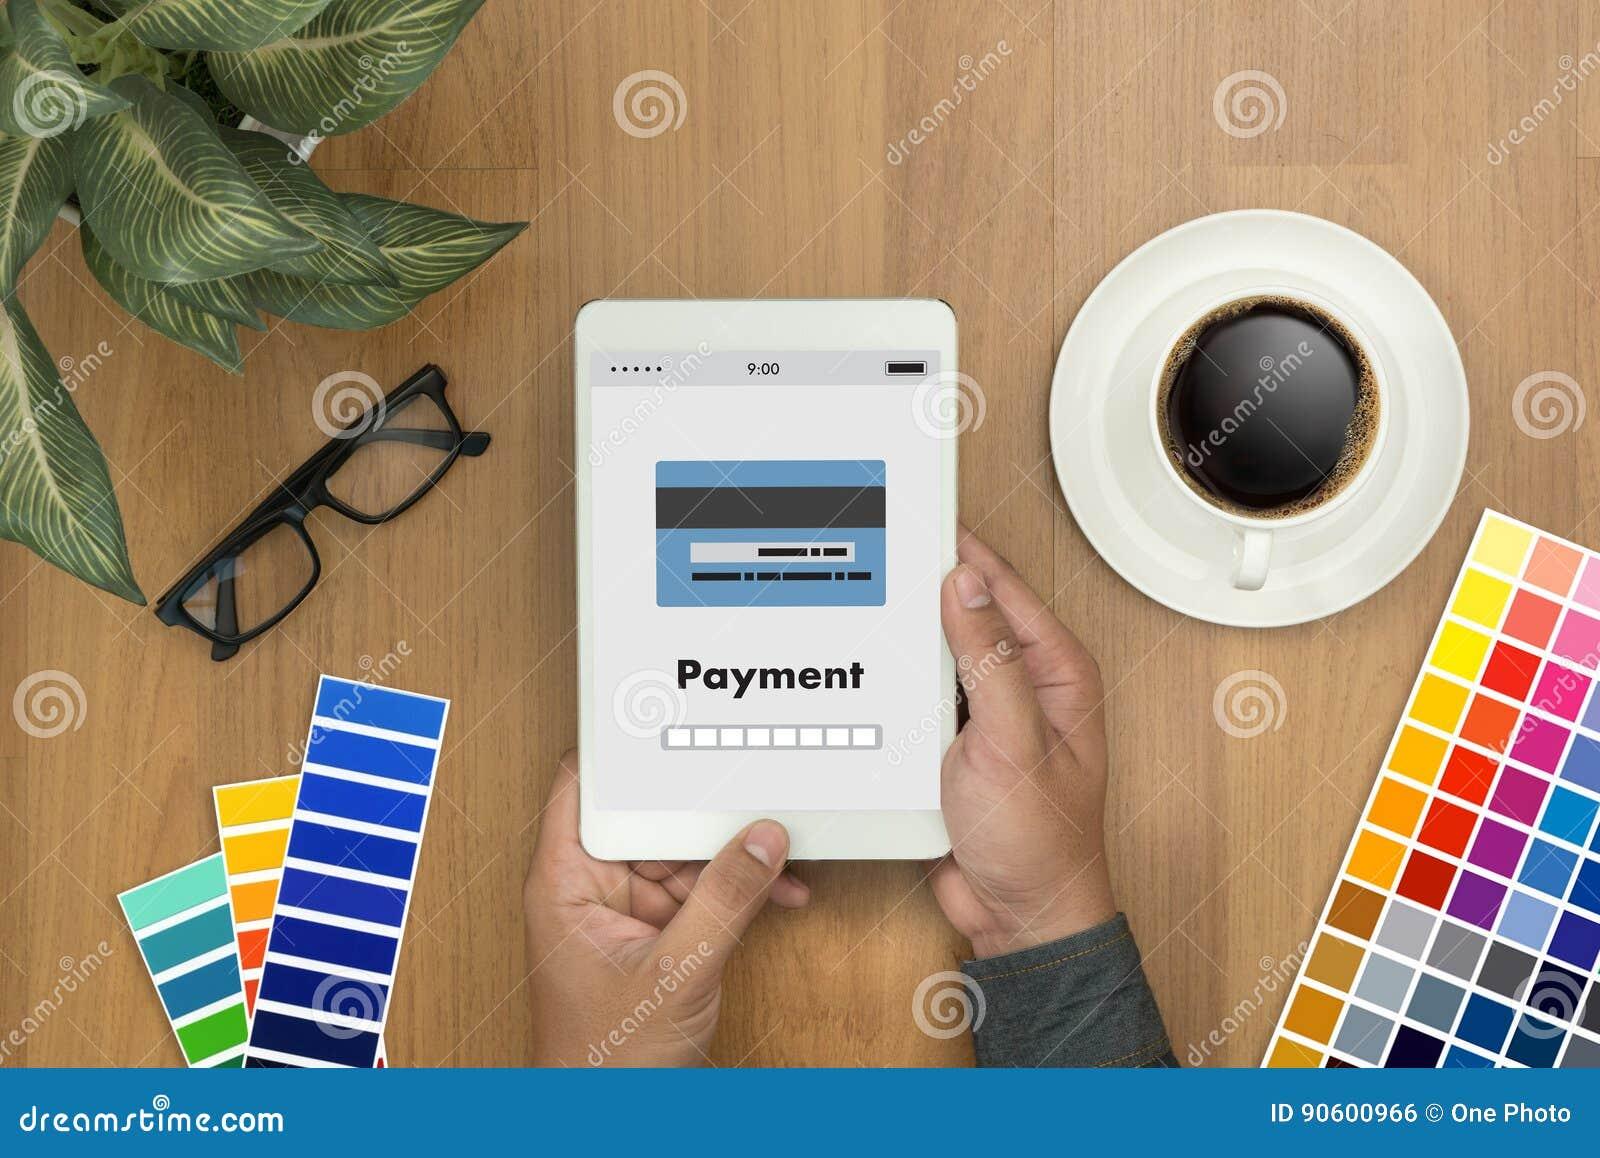 Bank security man uses black credit card to call an escort